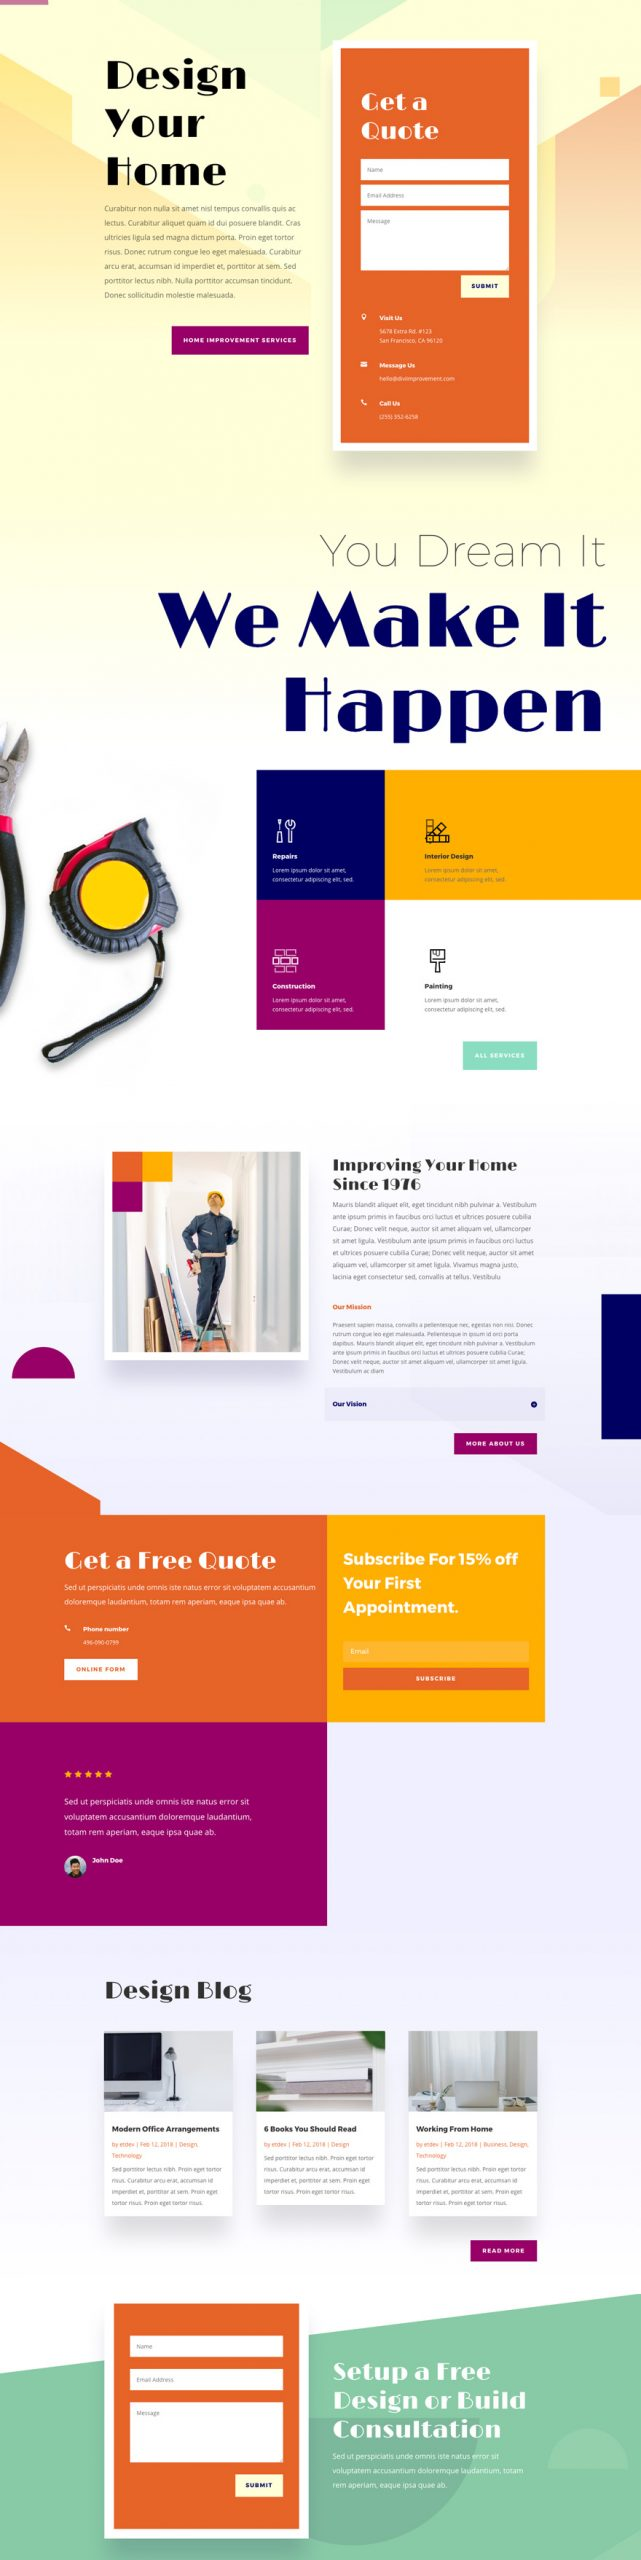 Home Improvement - Divi WordPress Website Design